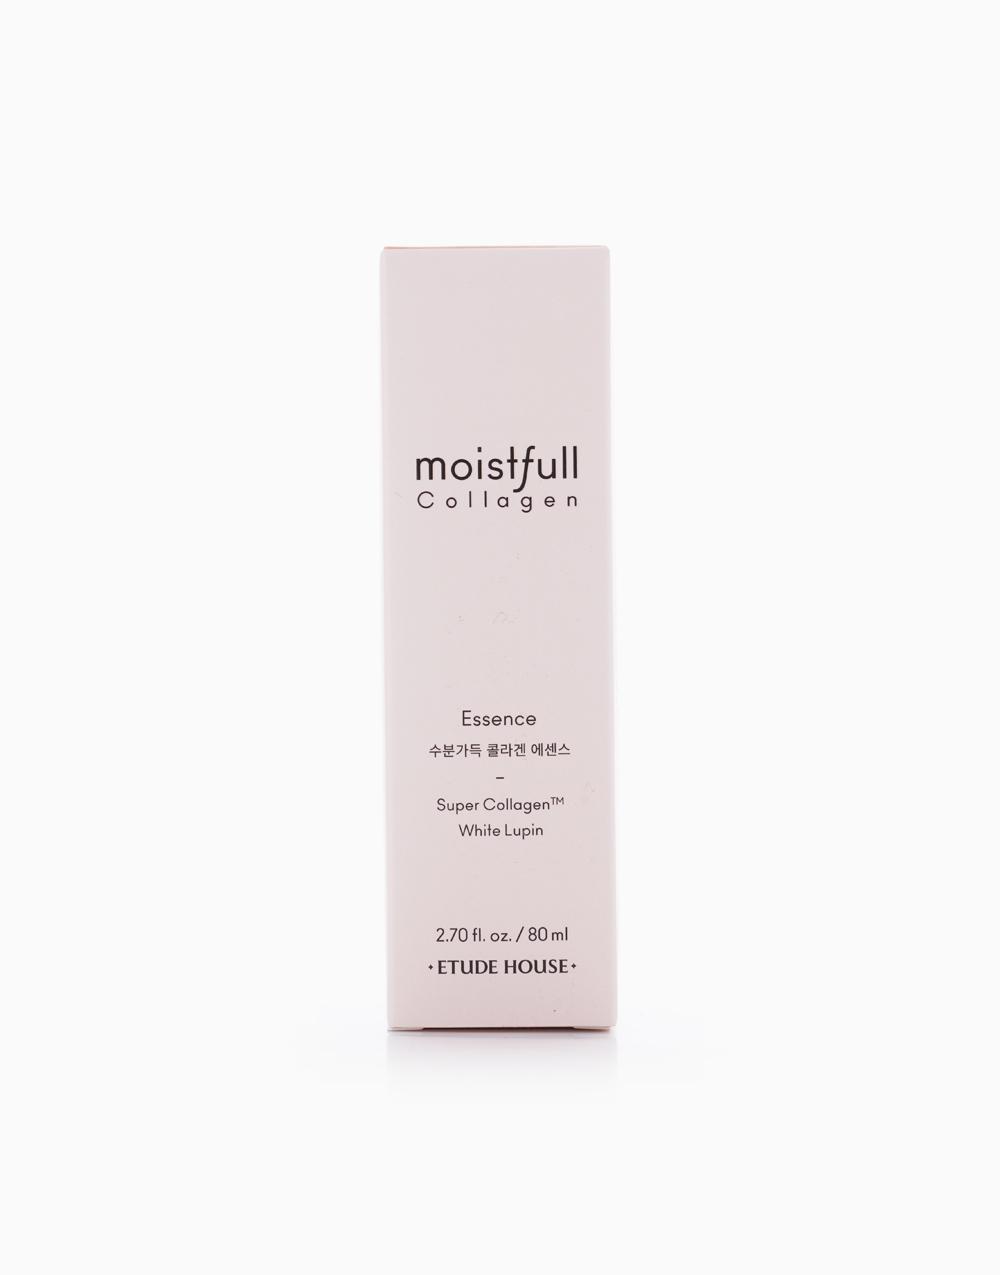 Moistfull Collagen Essence (80ml) by Etude House